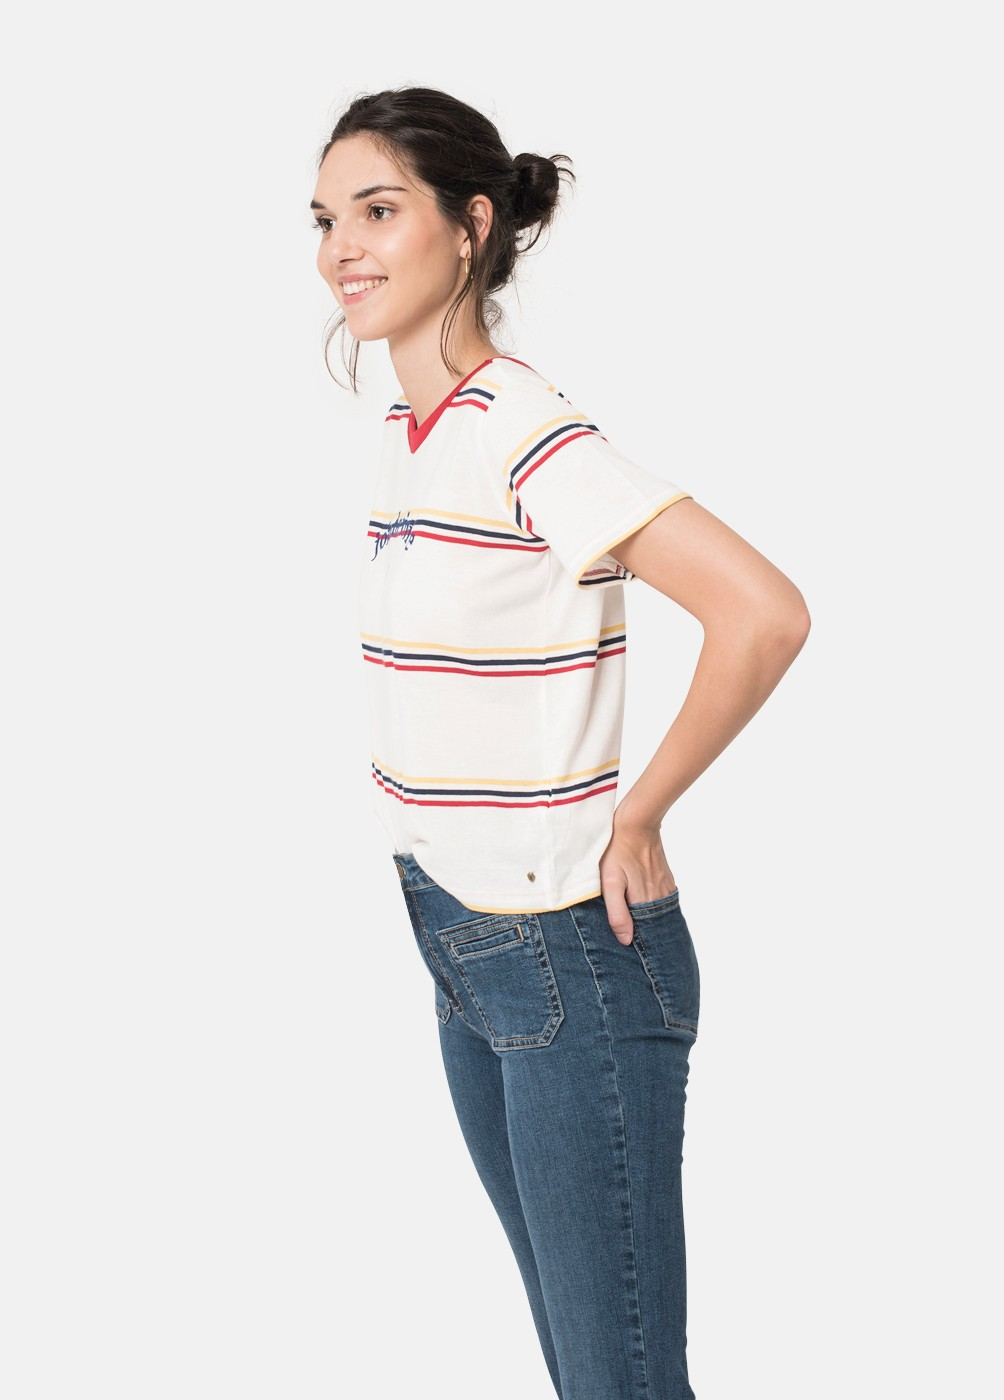 Camiseta Joie Rayas